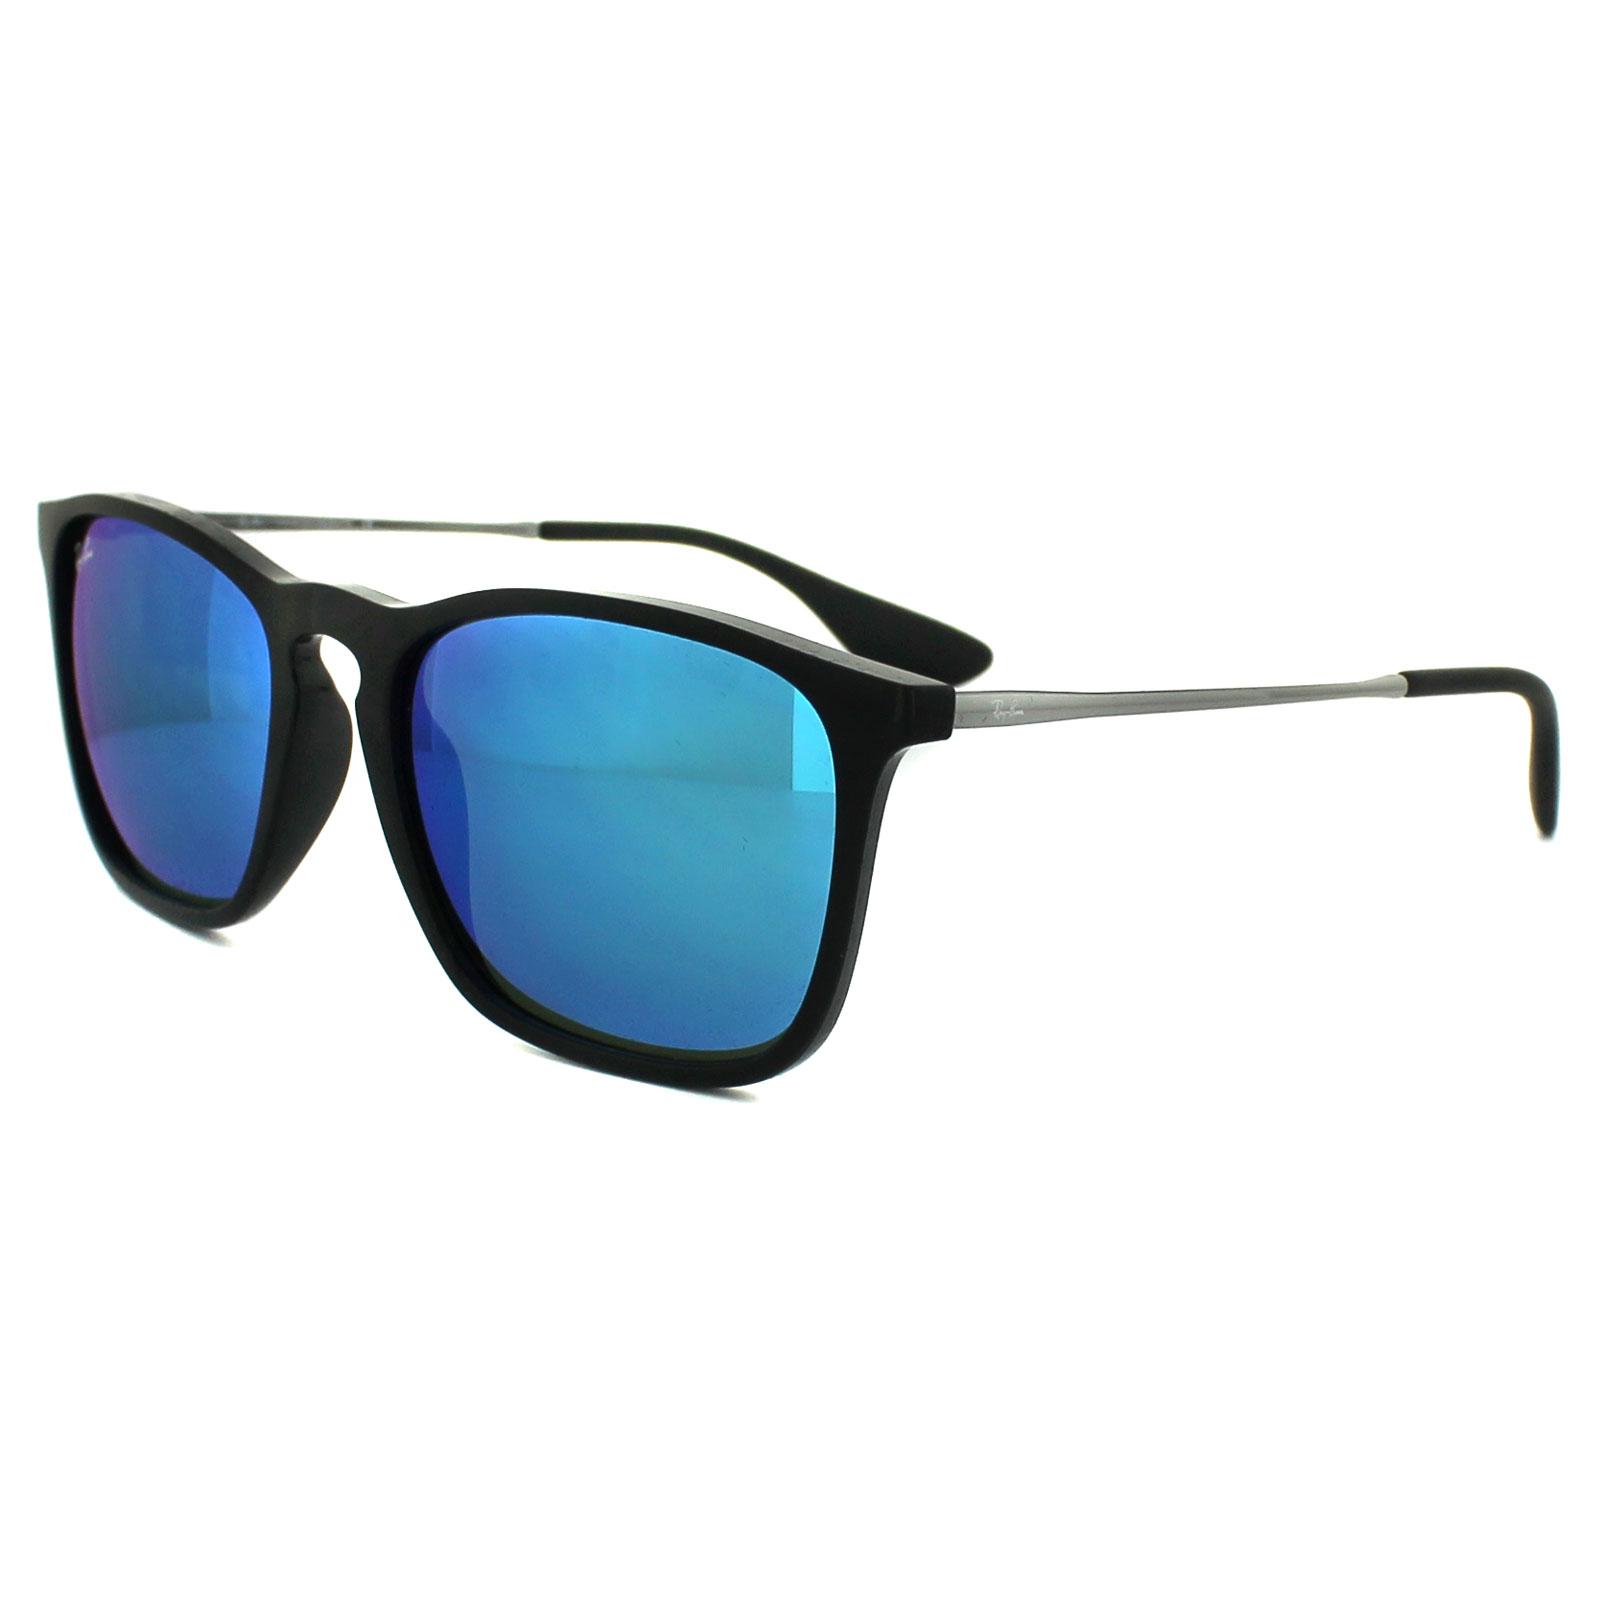 75f0d03b48a Sentinel Ray-Ban Sunglasses Chris 4187 601 55 Black   Gunmetal Blue Mirror